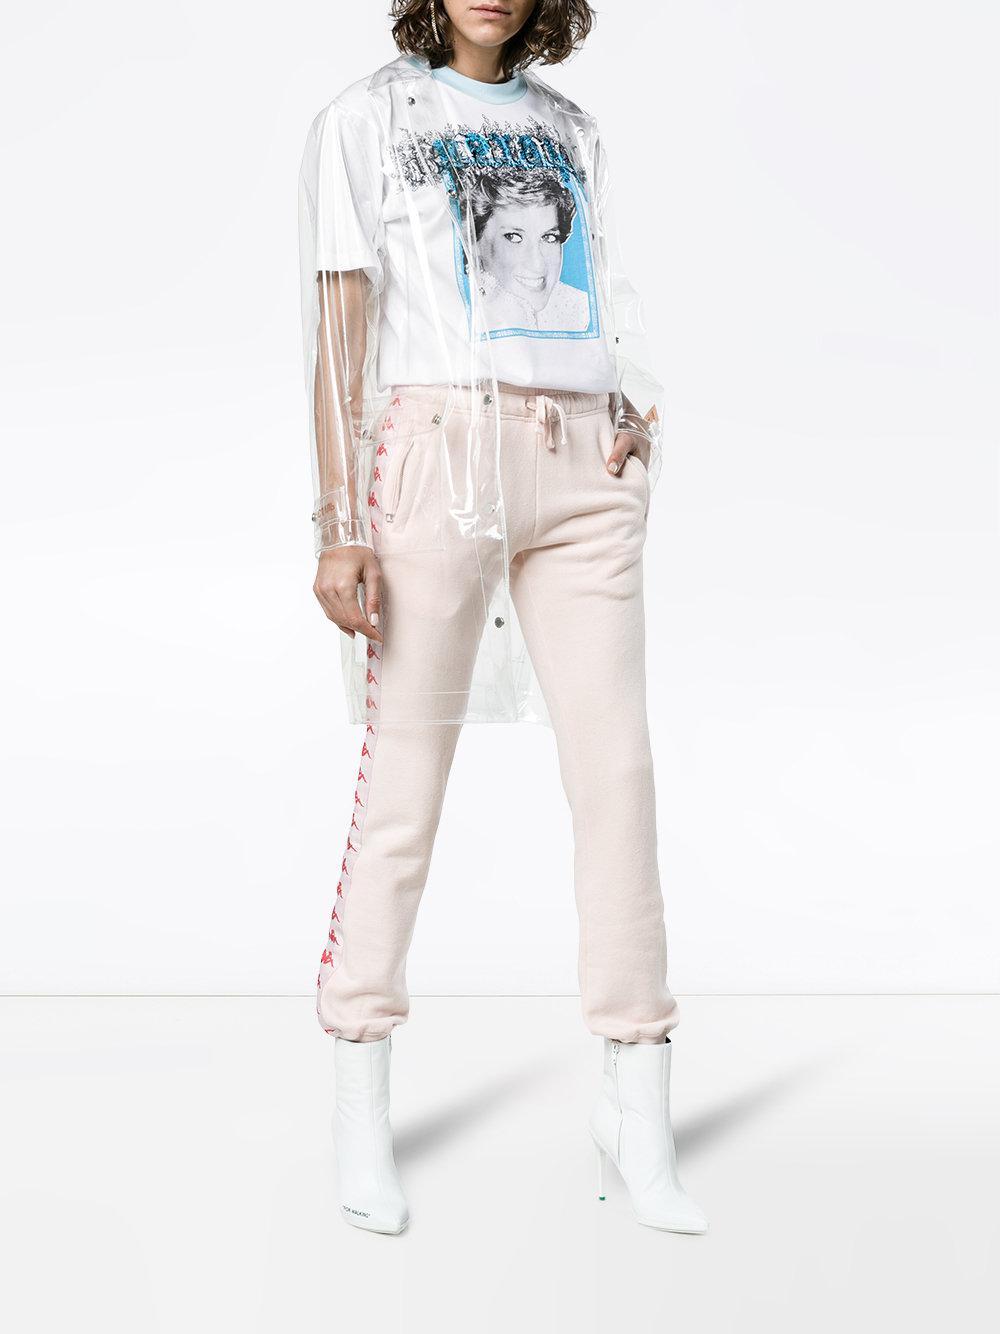 ec38658b Off-White c/o Virgil Abloh Tribute 1 Princess Diana T-shirt in White - Save  57% - Lyst